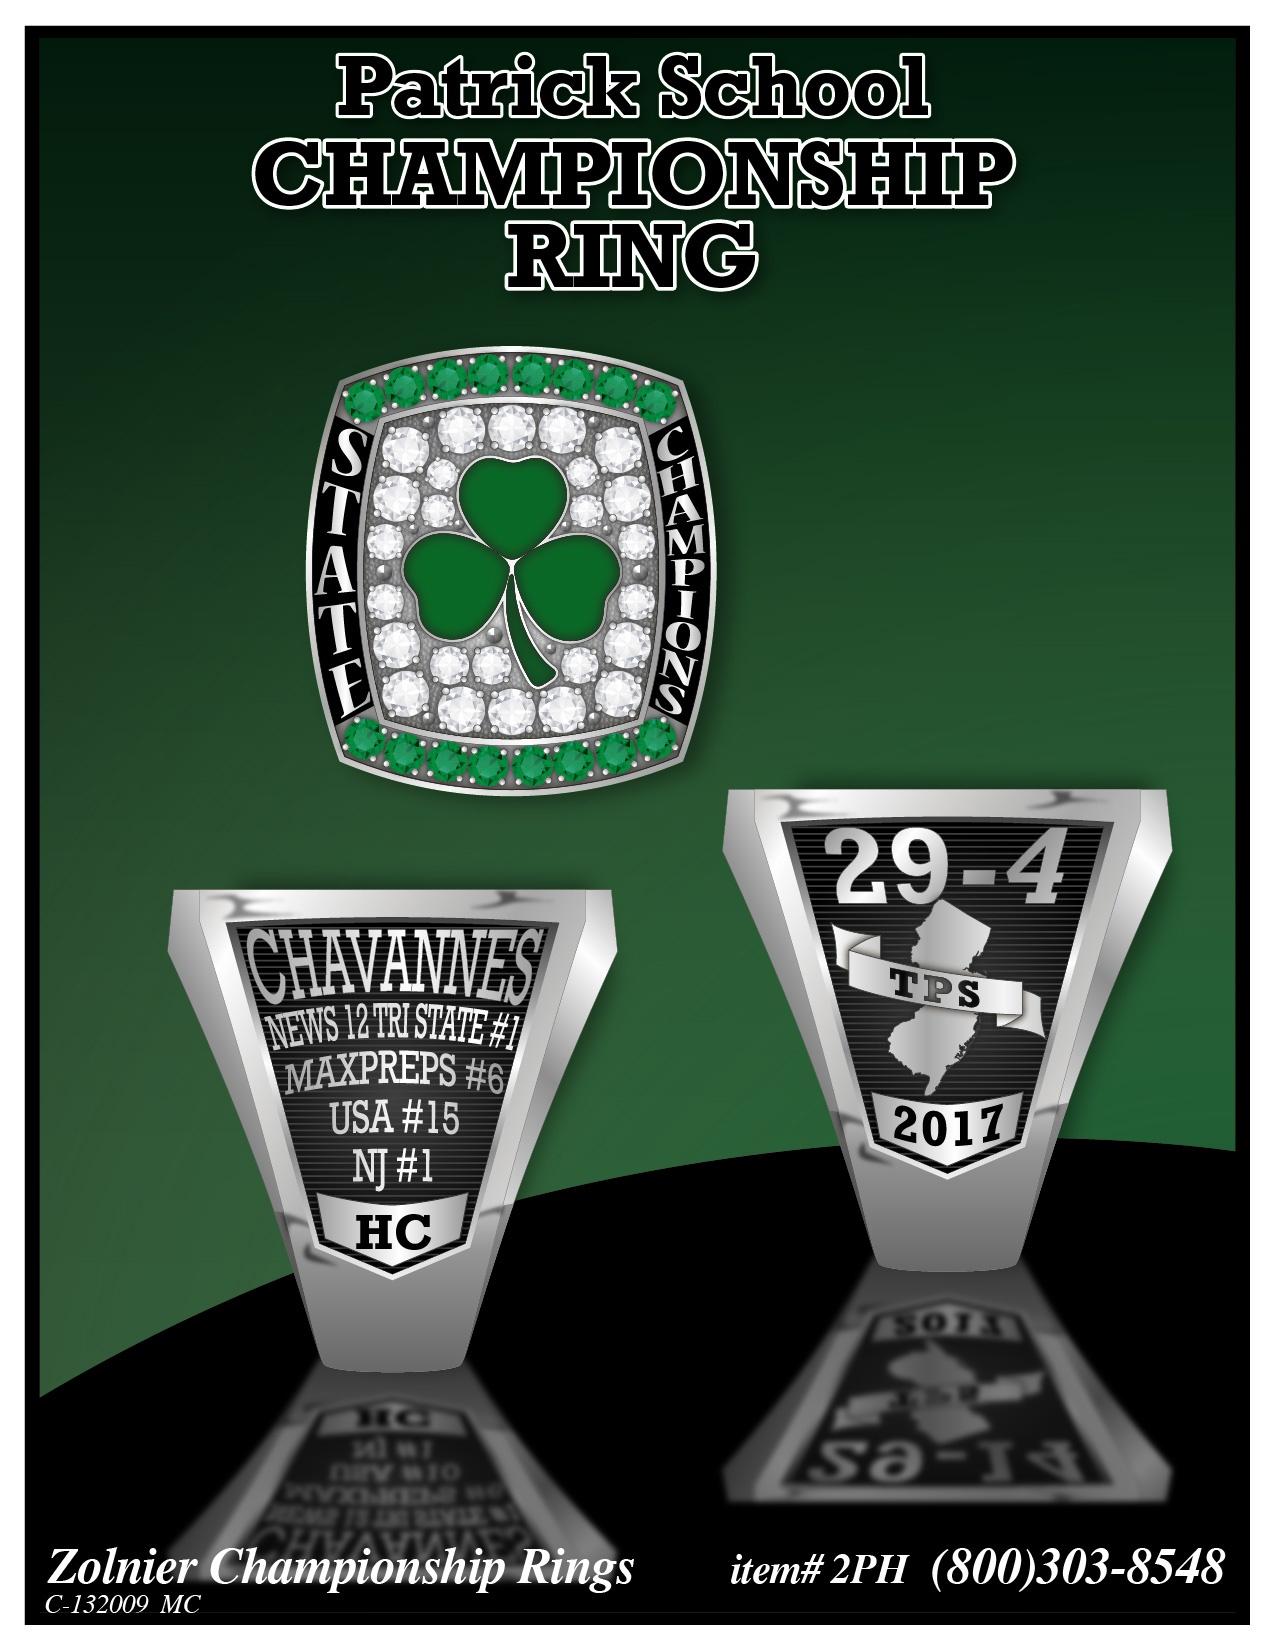 C-132009 Patrick Basketball Championship Ring MC-01